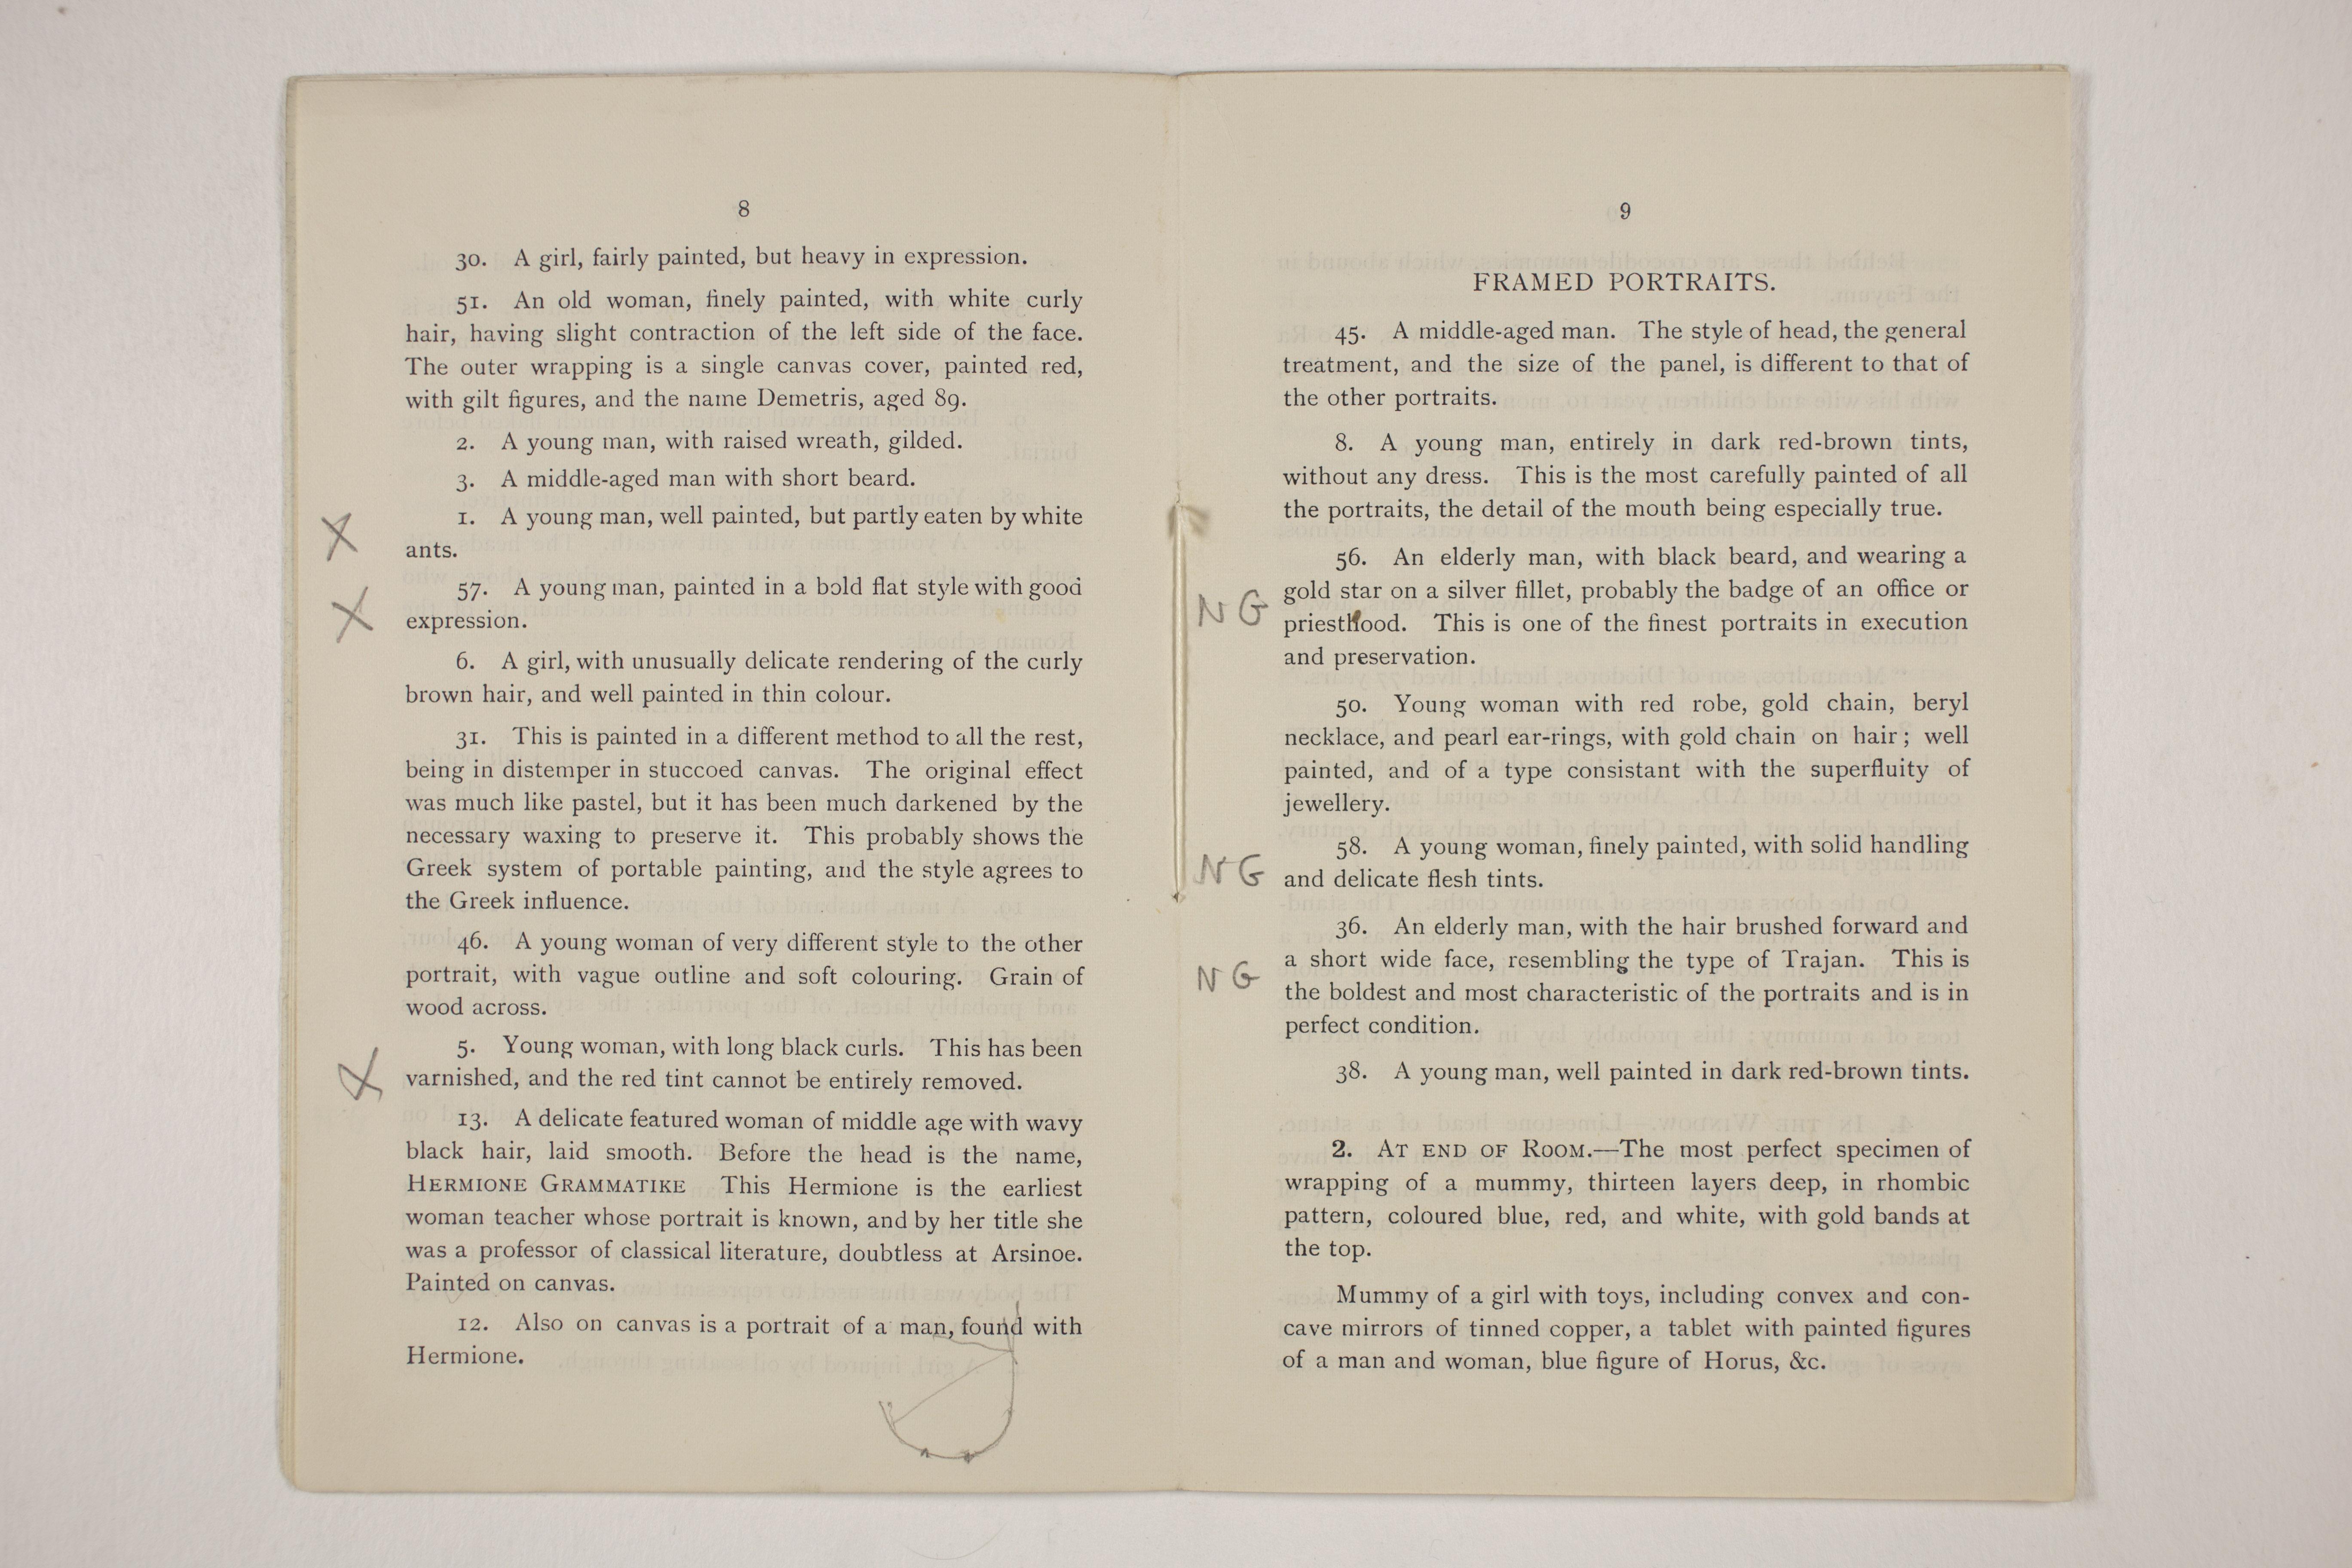 1910-11 Hawara, Gerzeh, Memphis, Mazghuneh Exhibition catalogue PMA/WFP1/D/19/33.6